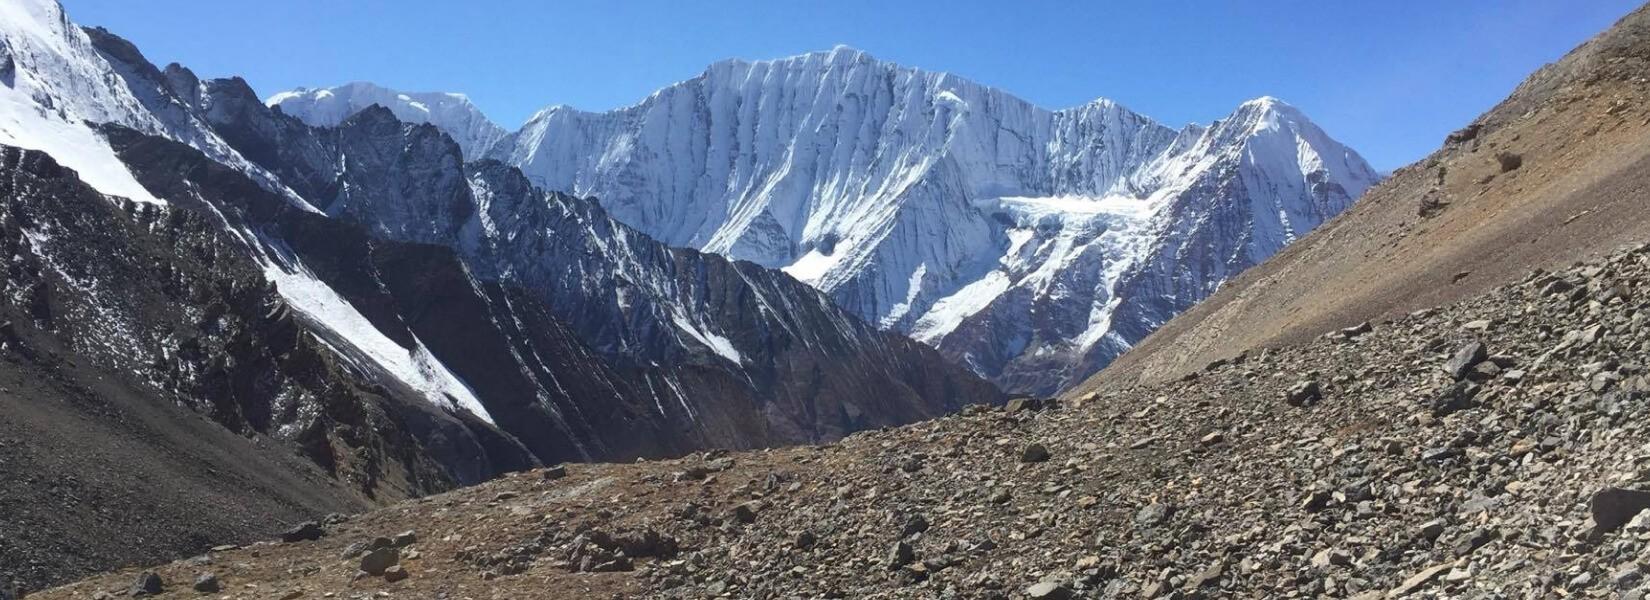 Dolpa Trekking